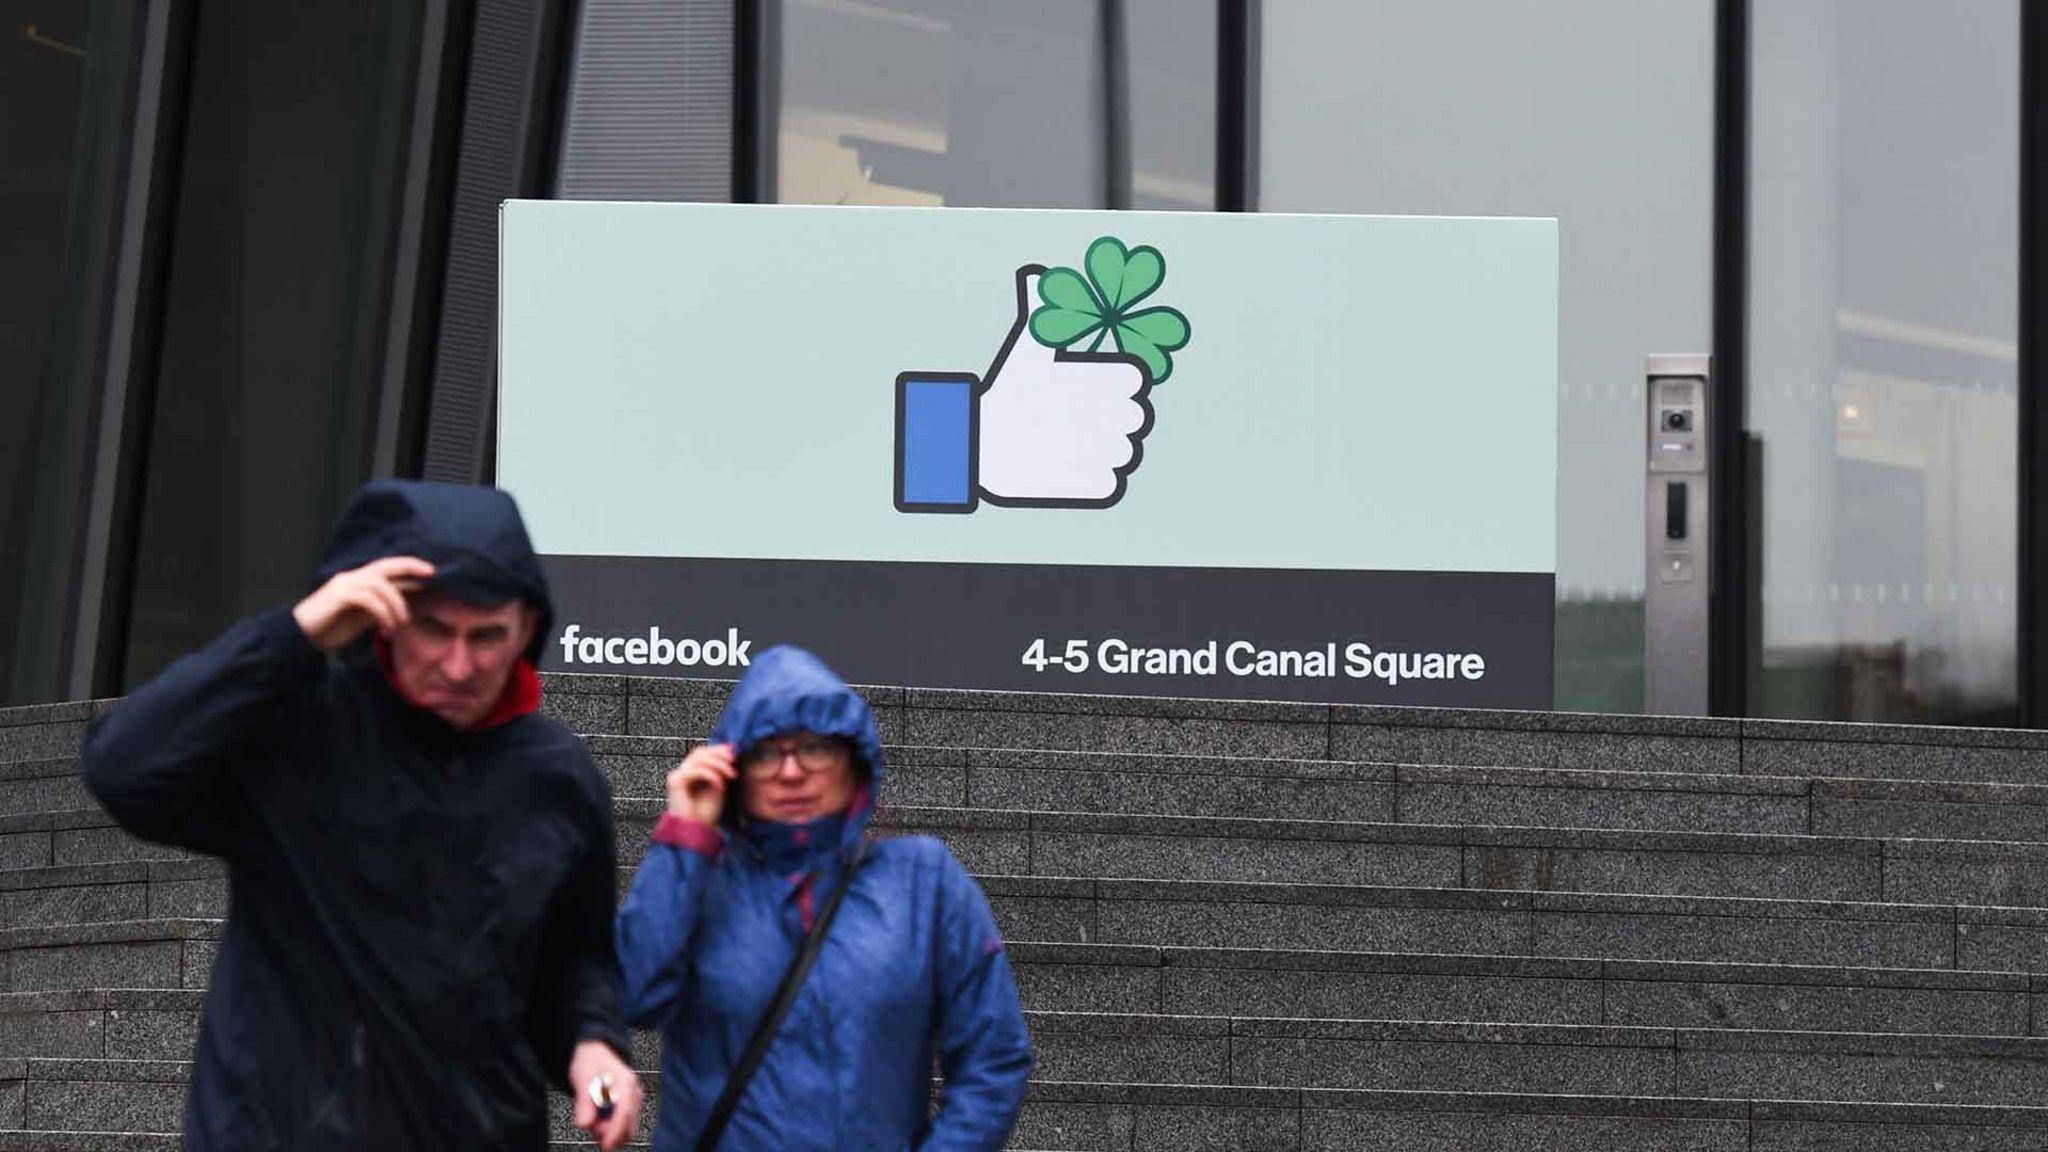 Outside Facebook HQ in Dublin